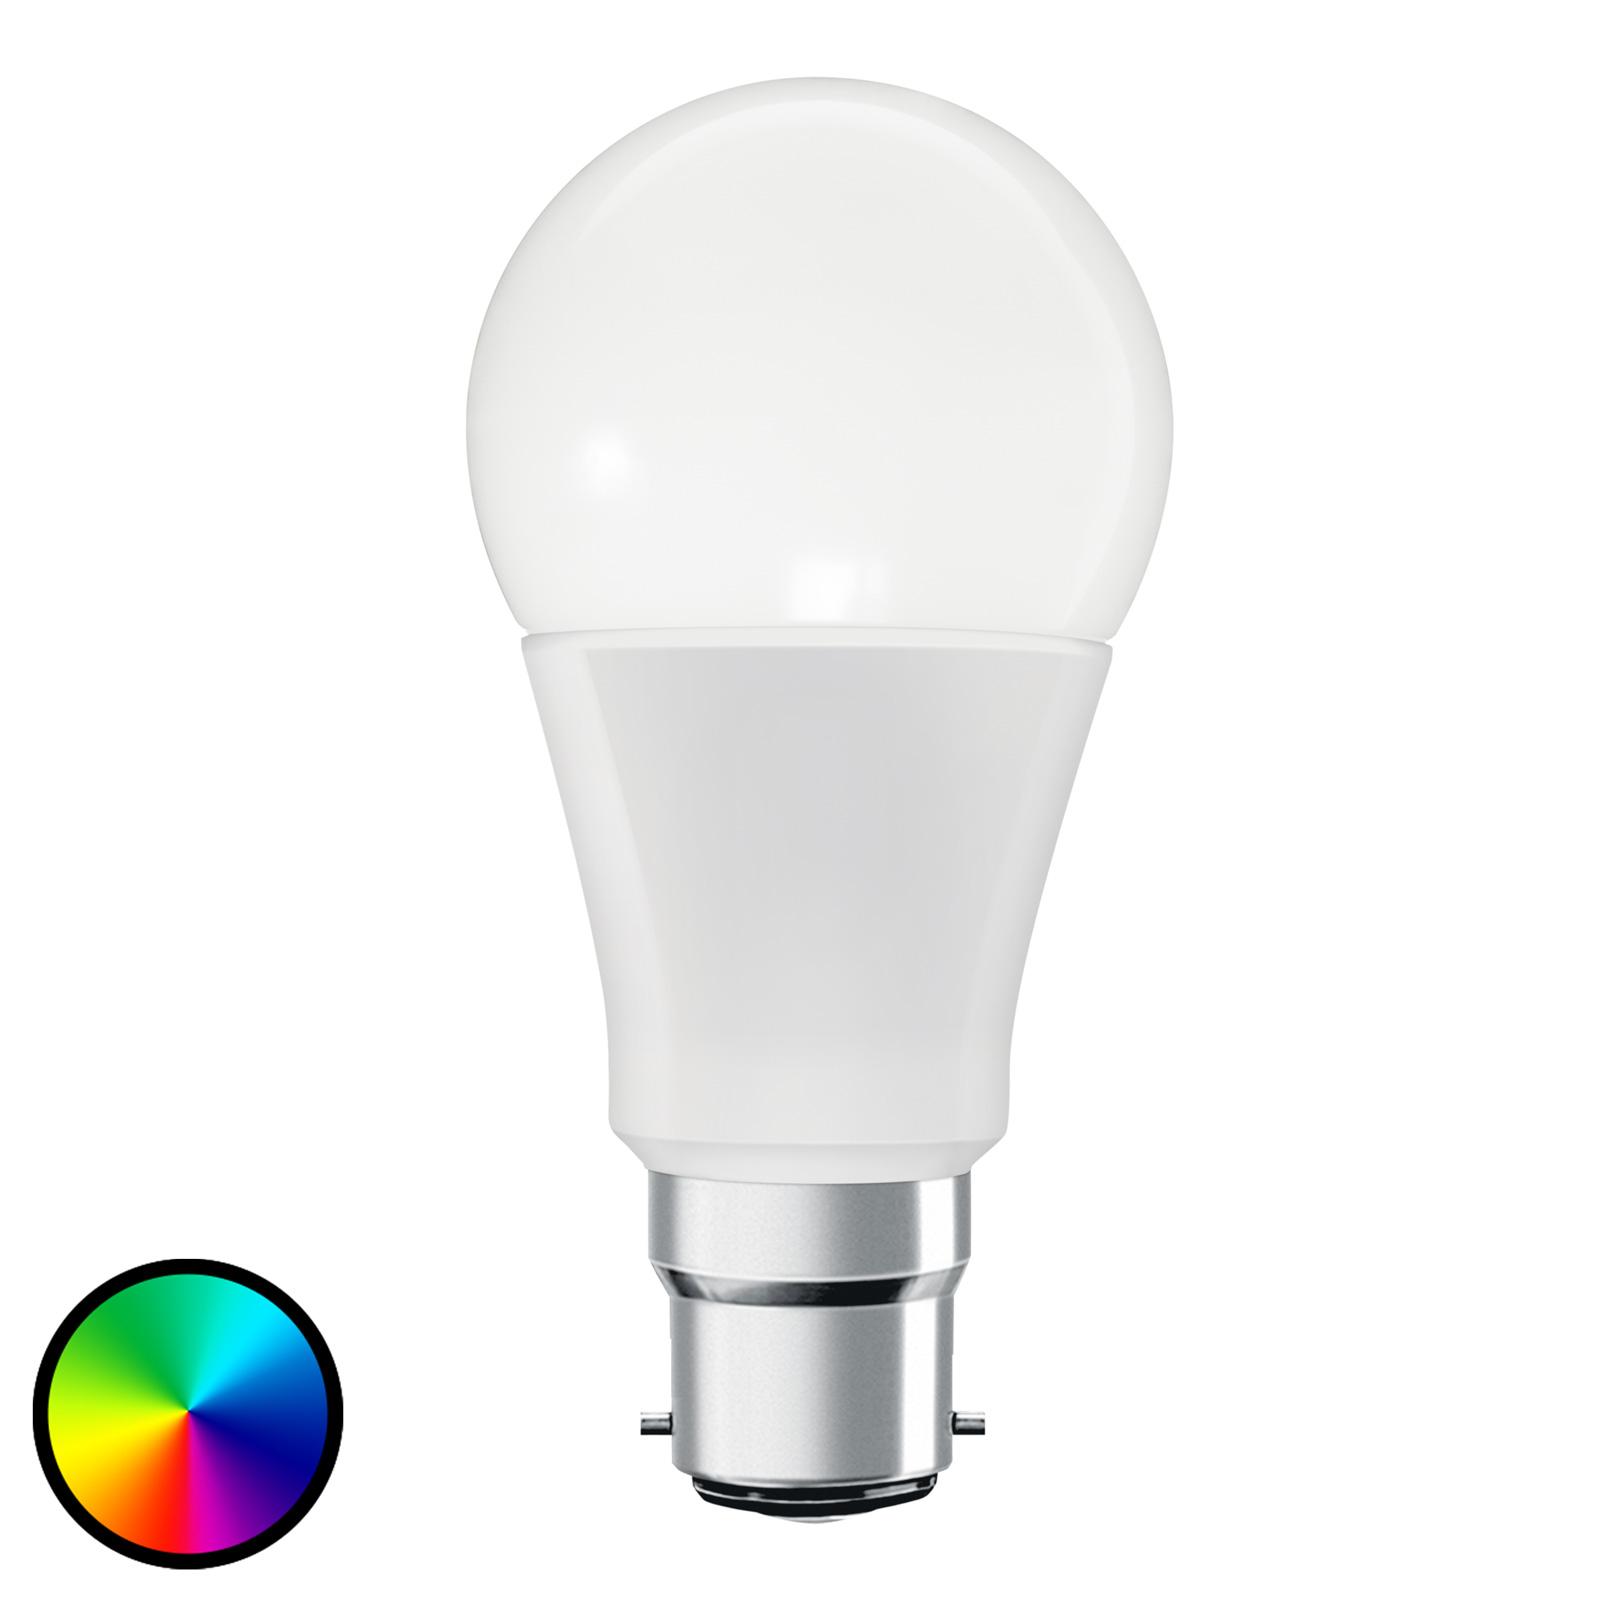 LEDVANCE SMART+ ZigBee B22d 10W RVB 2000-6500K